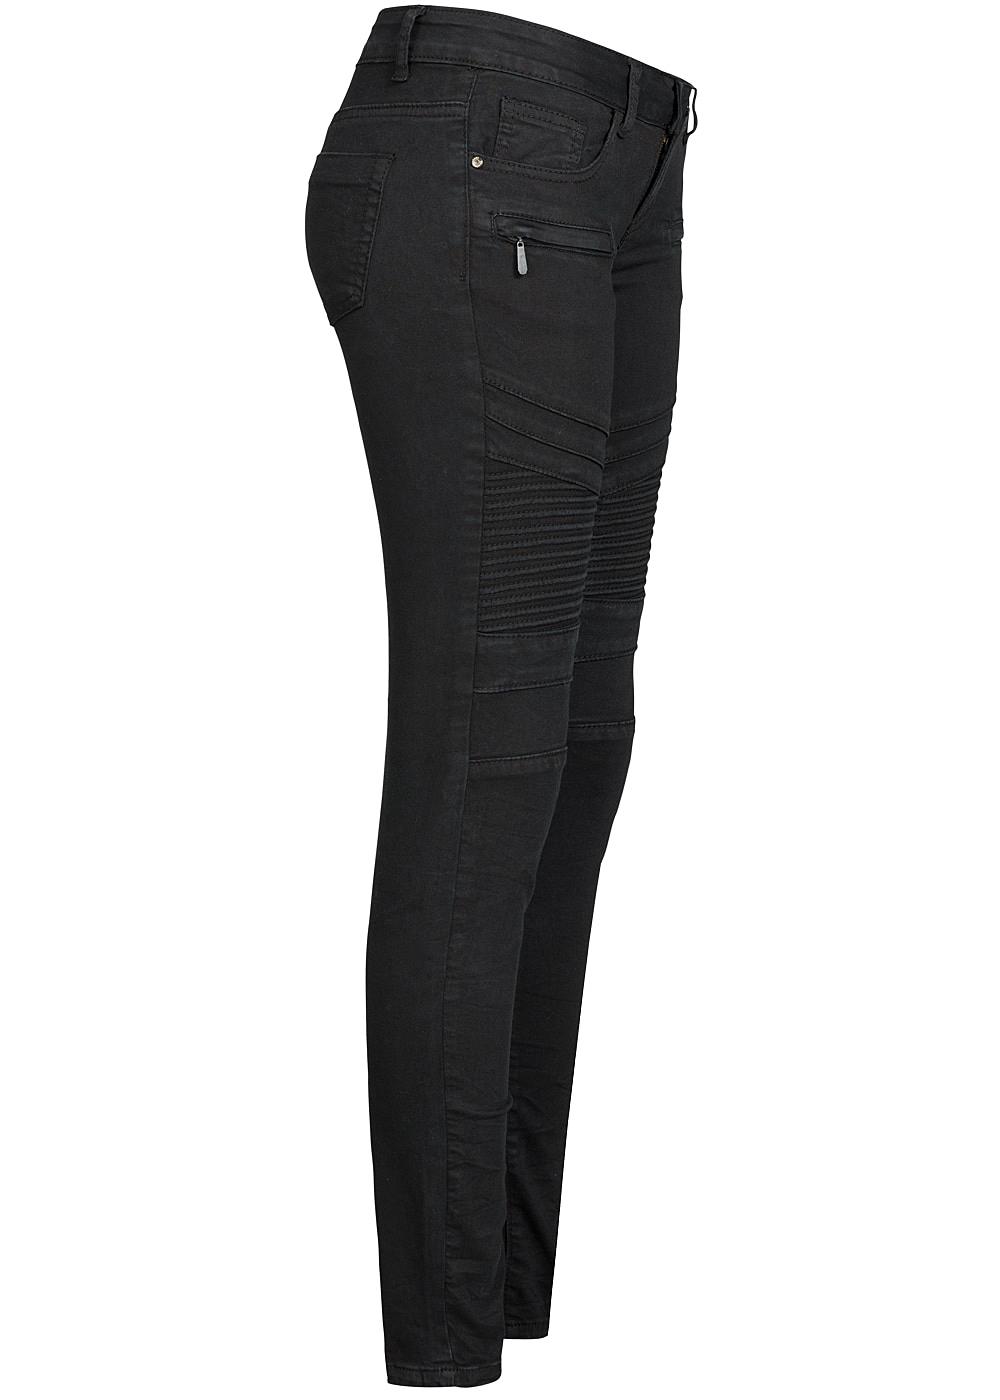 seventyseven lifestyle damen biker jeans hose 5 pockets 2 deko zipper schwarz 77onlineshop. Black Bedroom Furniture Sets. Home Design Ideas